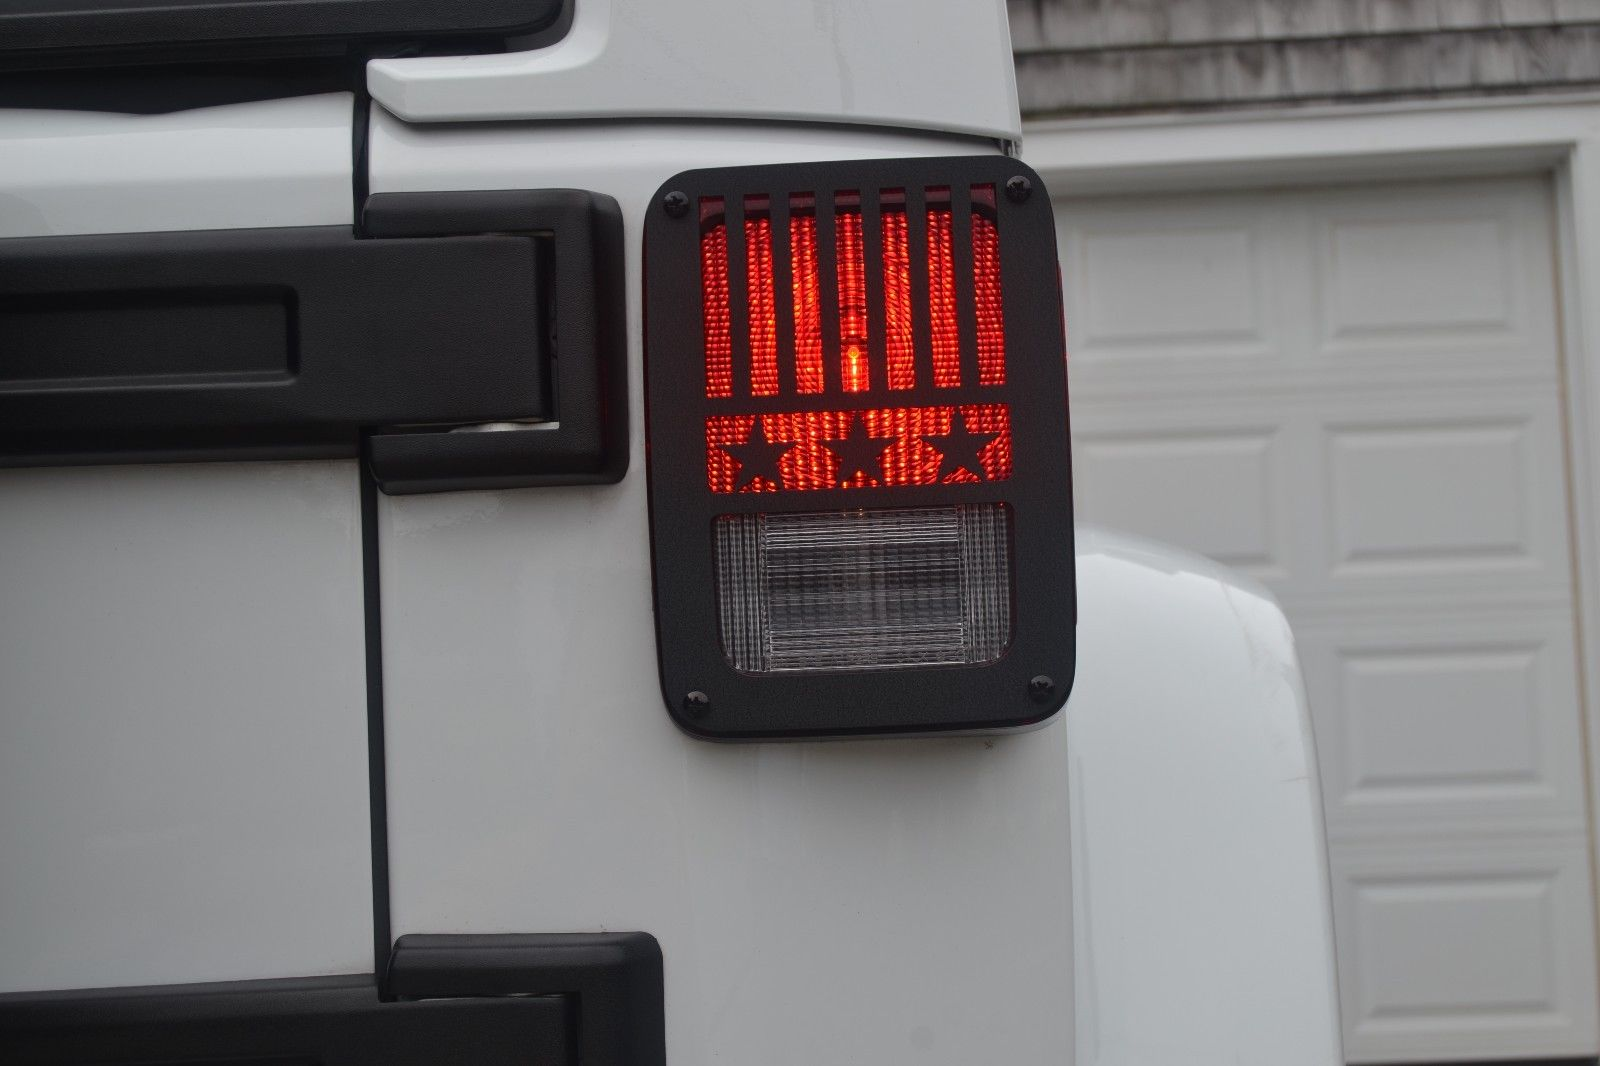 US ライトガード プロテクター JT14-Bジープは星と縞を微調整するテールライトガードジープラングラーJK 07-16 JT14-B Jeep Tweaks Stars And Stripes Tail Light Guards Jeep Wrangler JK 07-16